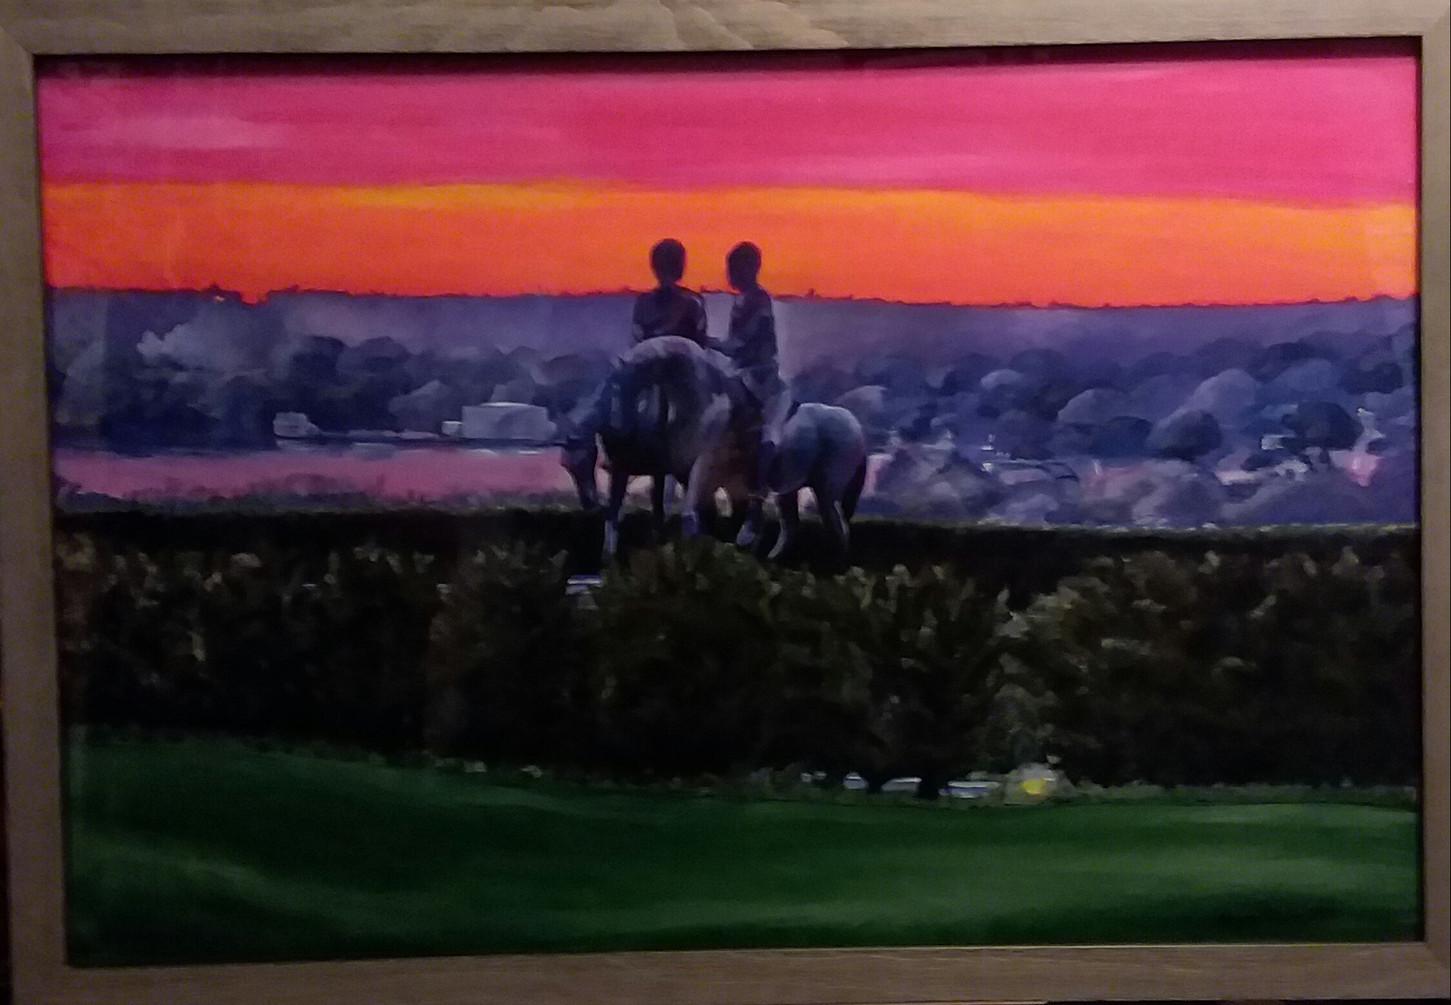 Sunset in Nauvoo